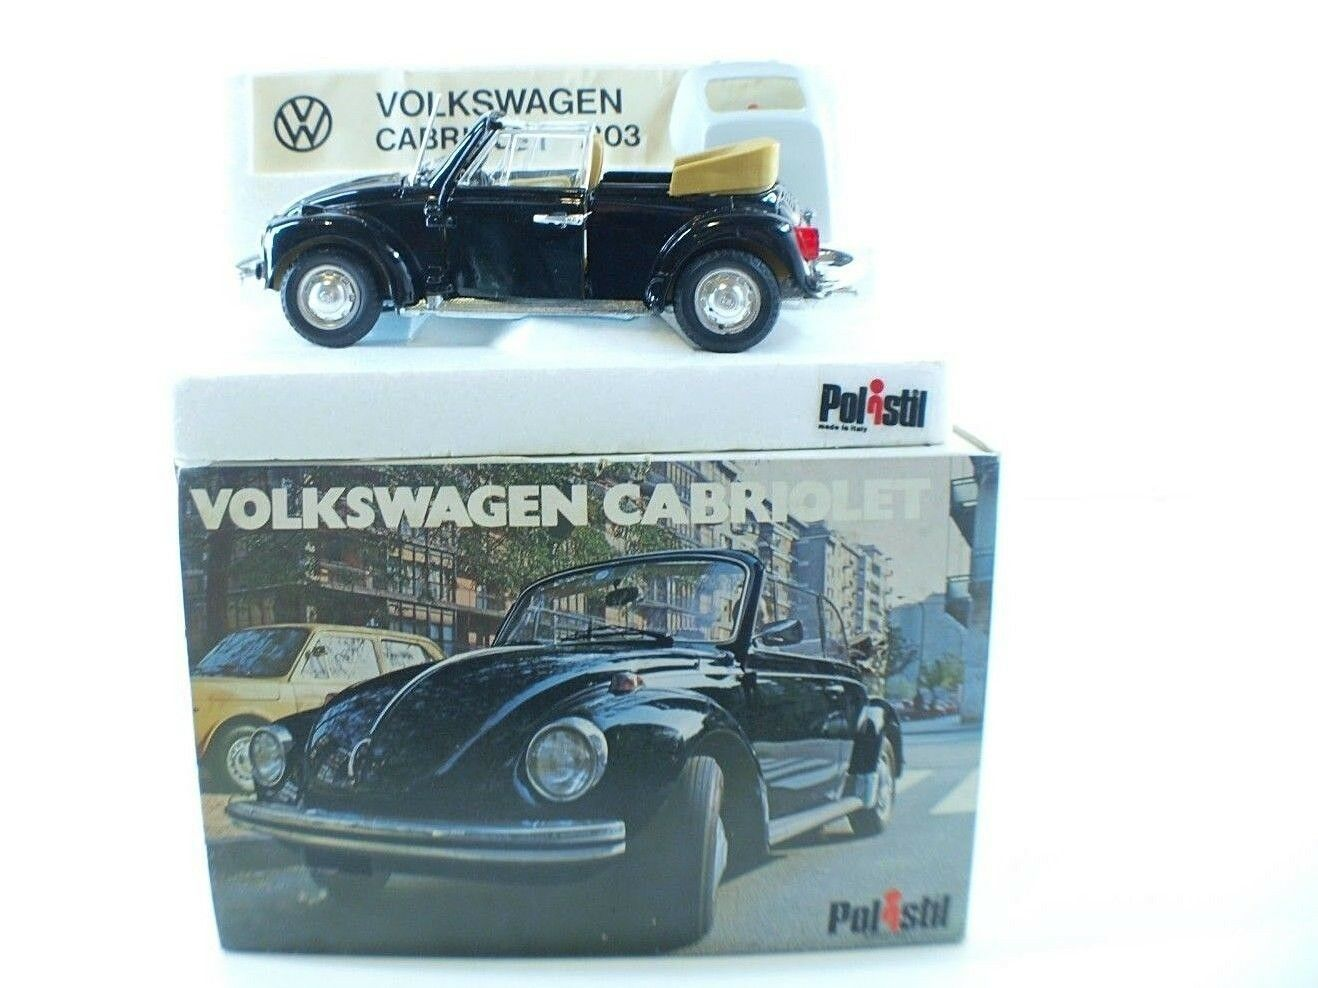 Polistil S15 Volkswagen cabriolet 1303 1 25 neuf en boite Boxed Mint in Box